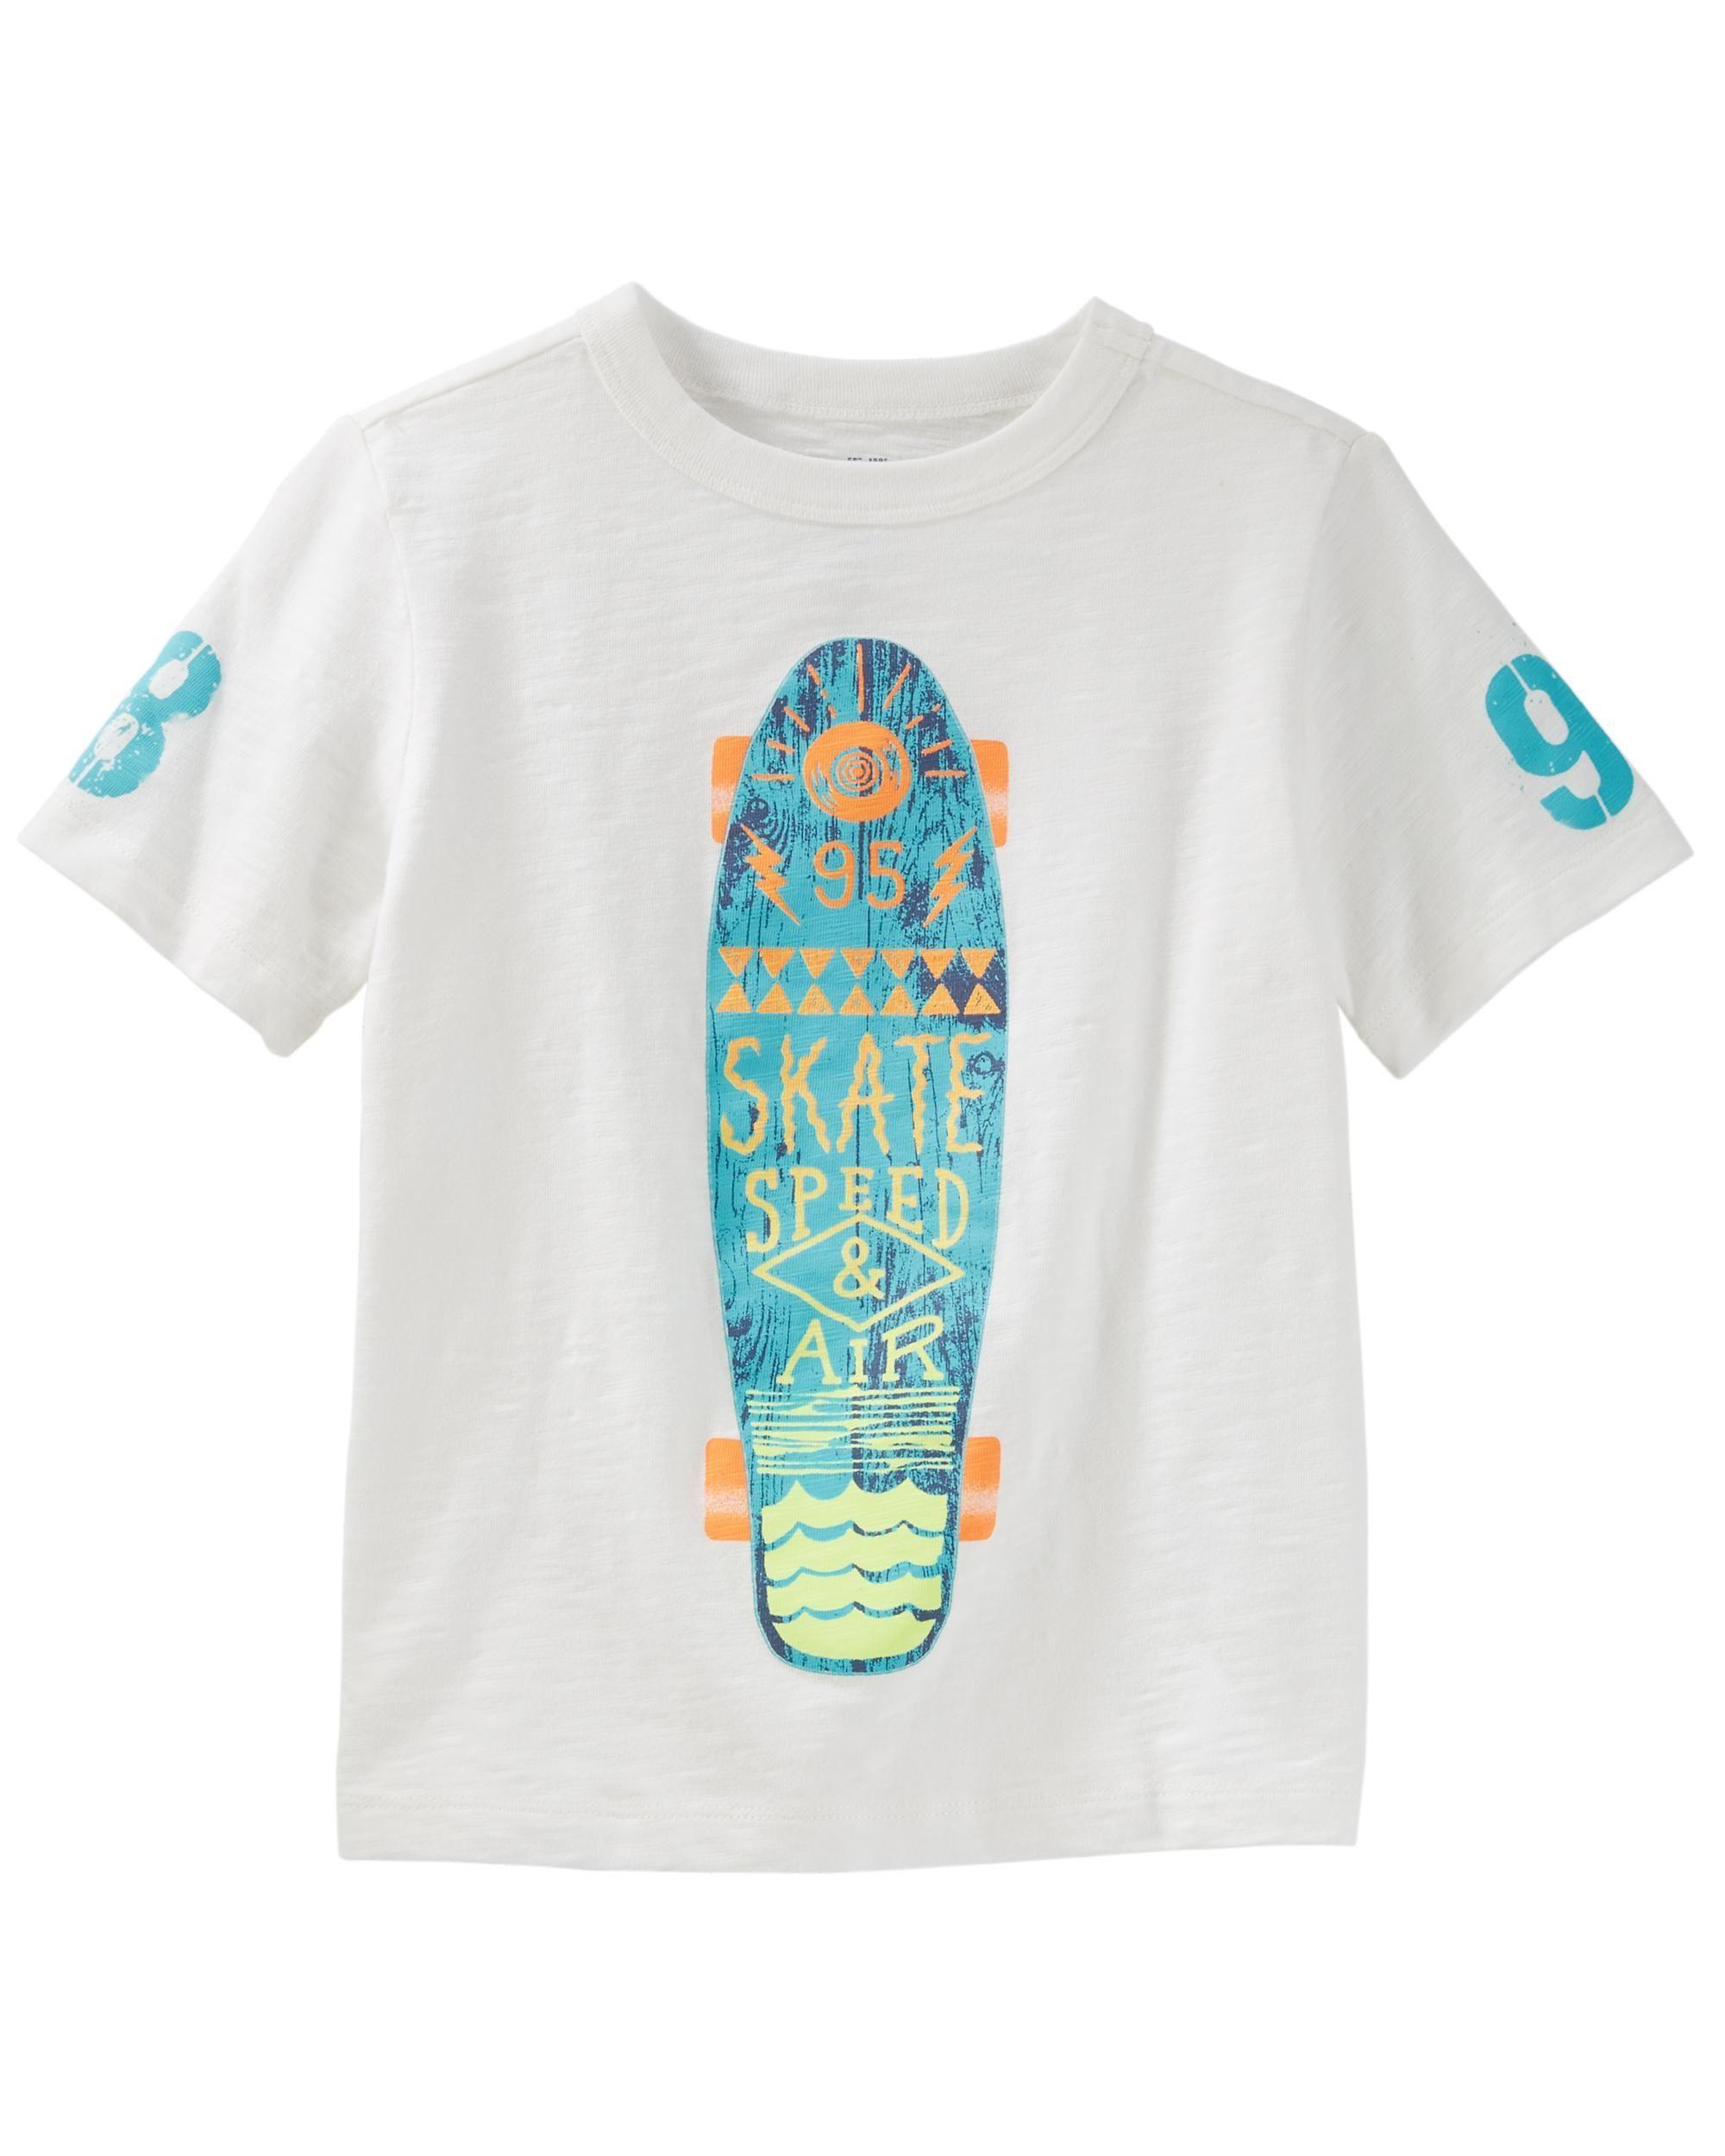 fa3023c766 Skateboard Tee | KIDSWEAR | Boys, Boys summer outfits, Kids boys